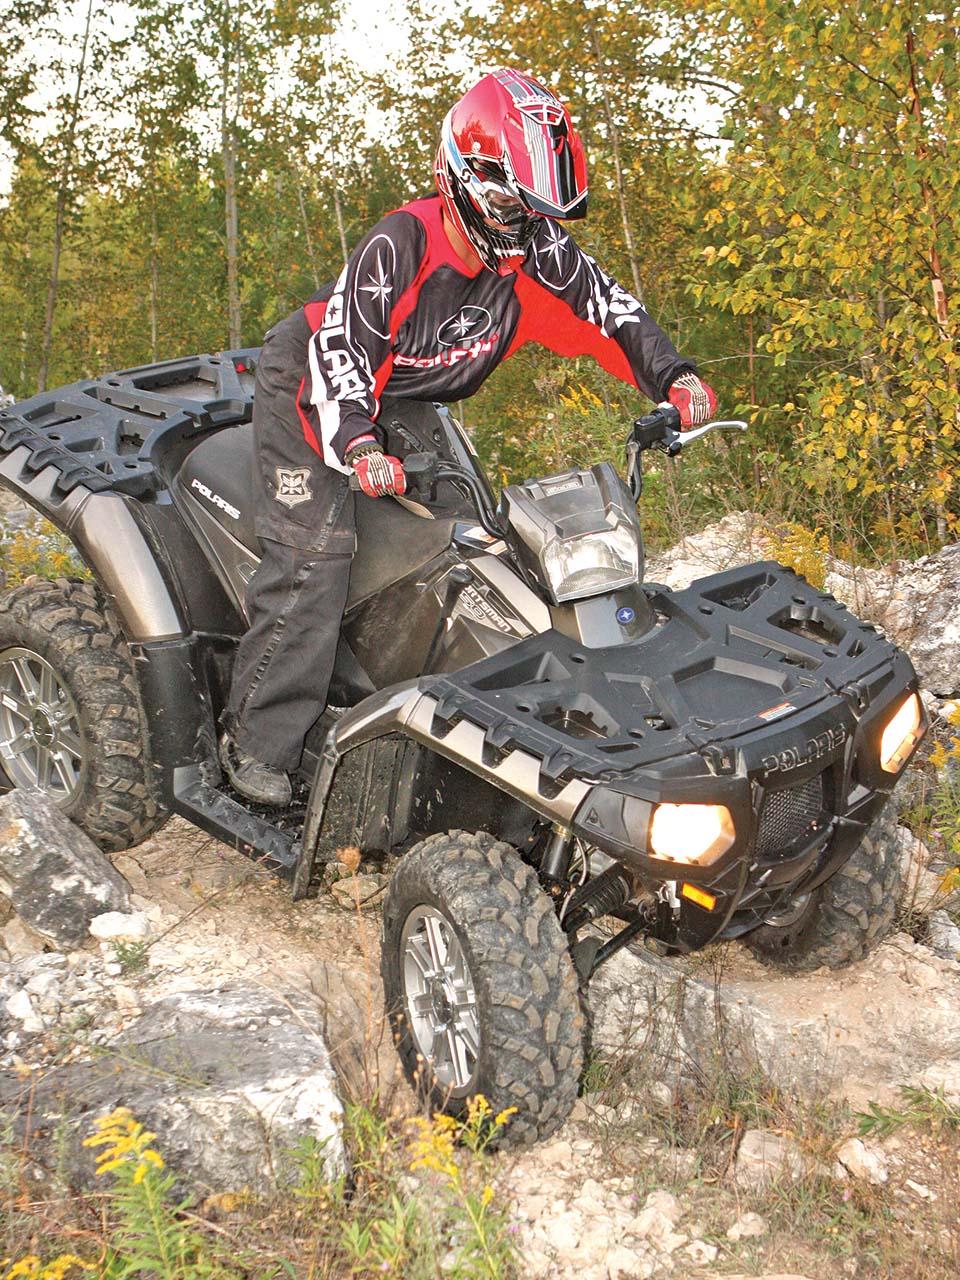 Ride Tested - The Polaris Sportsman 550 | ATV Illustrated